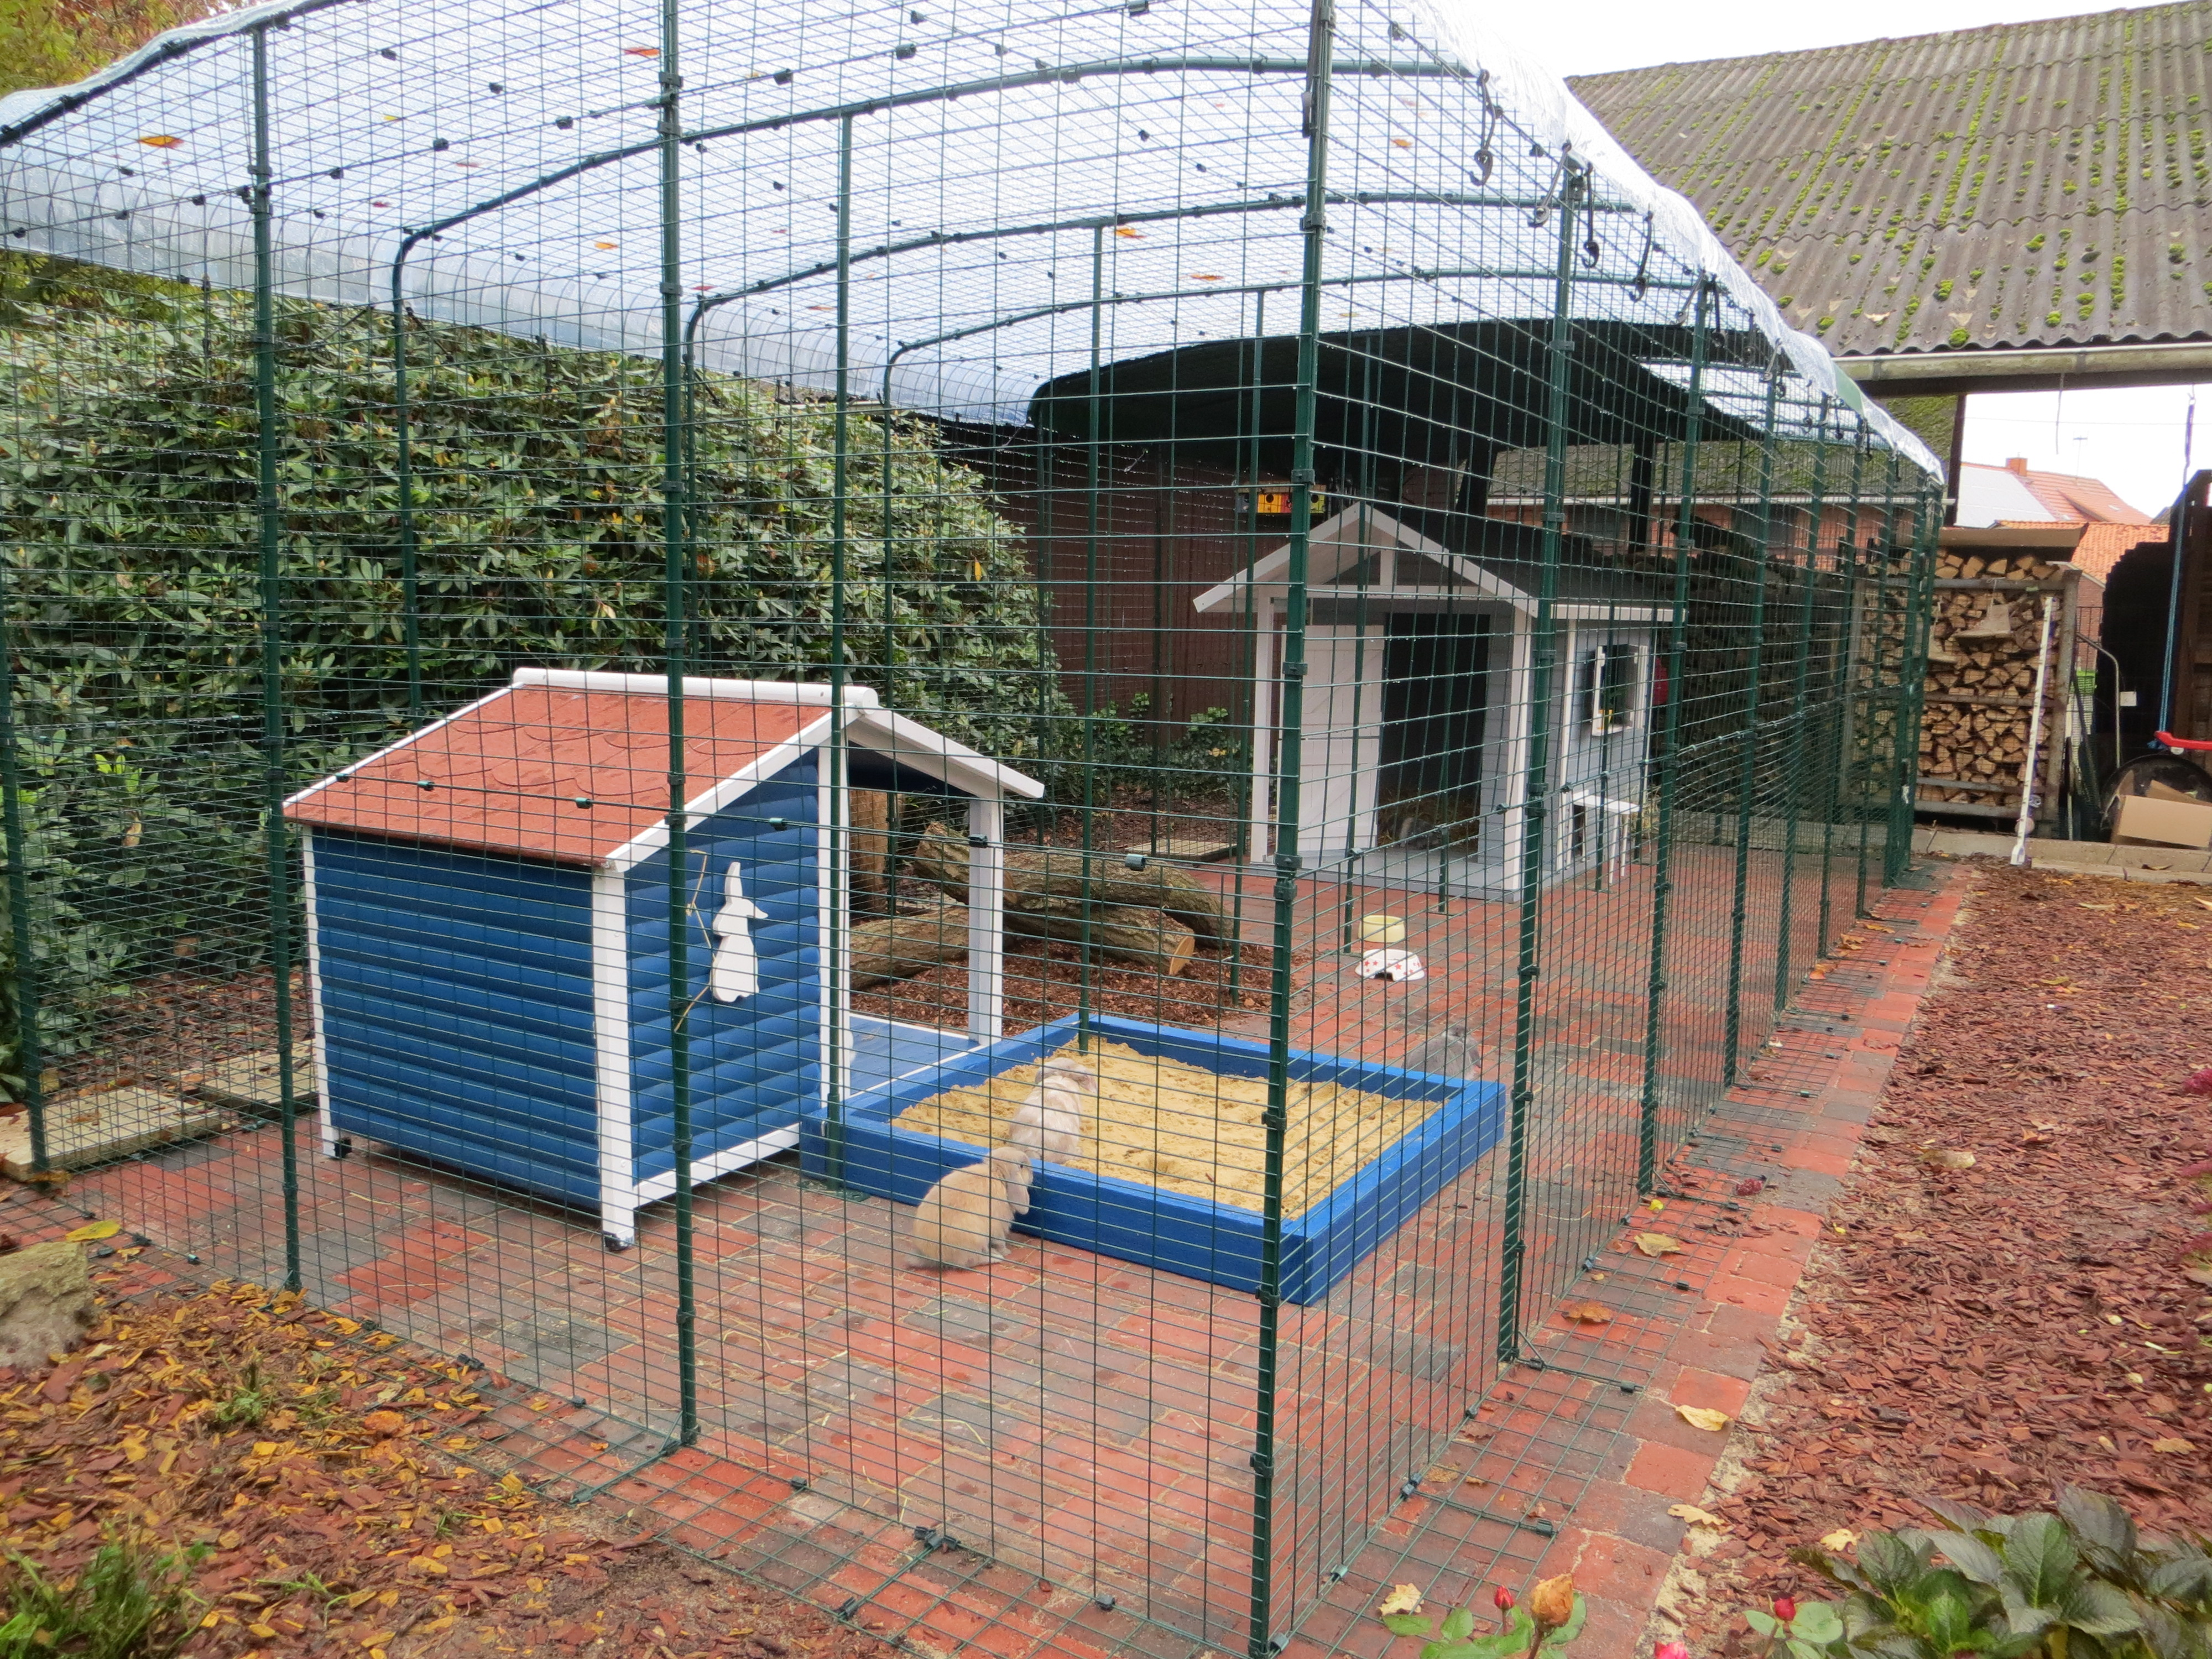 Big garden sheds outdoor kaninchengehege kaninchen omlet for Best deals on garden sheds